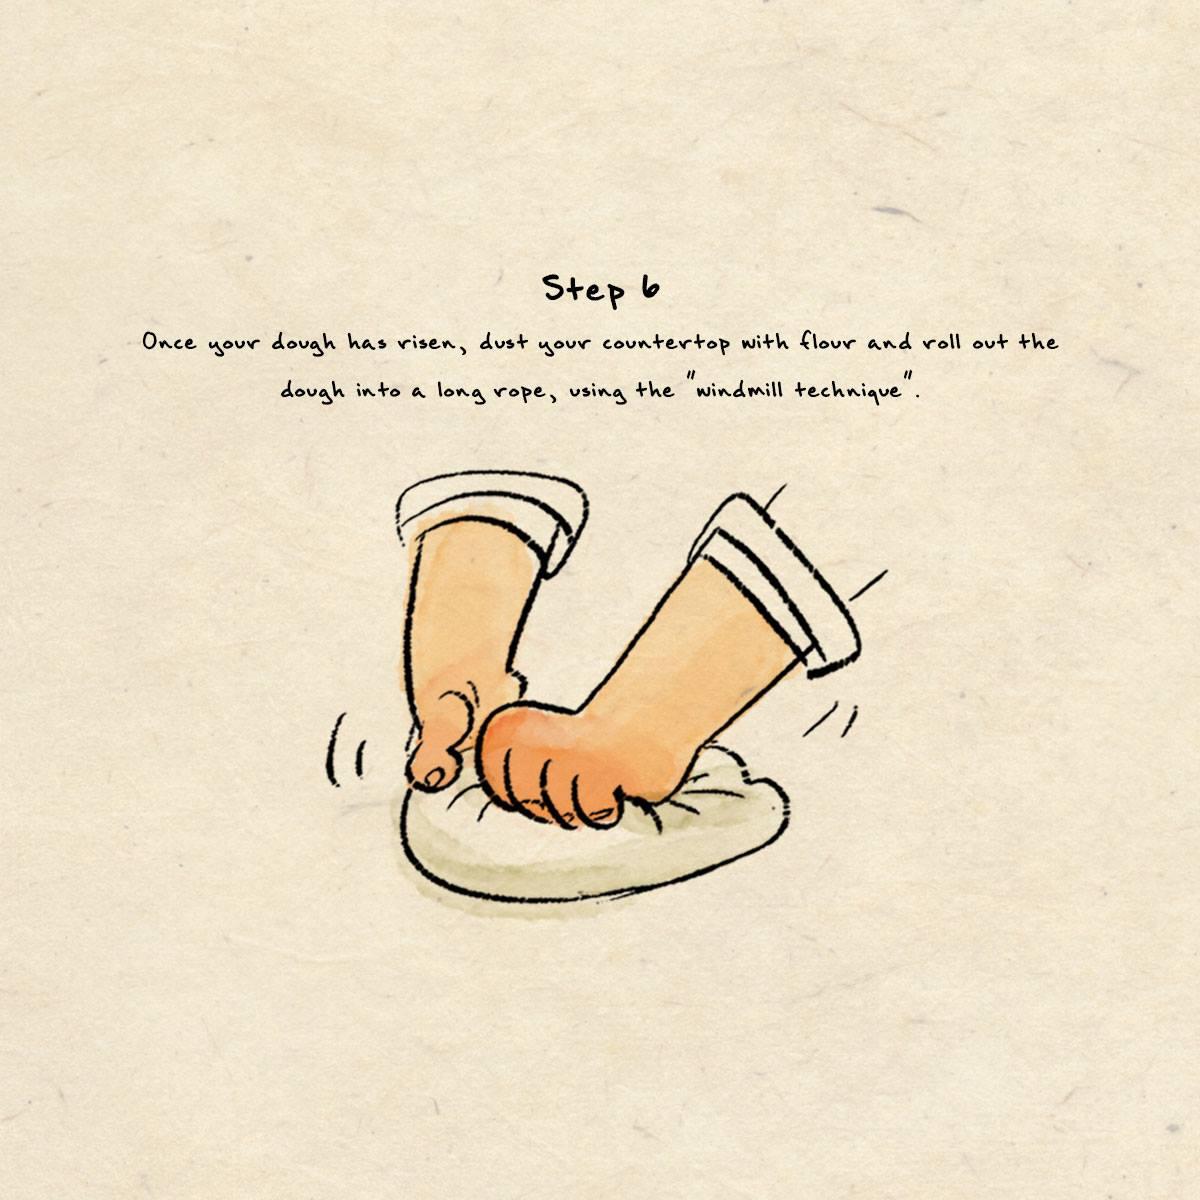 step 6 dumpling recipe